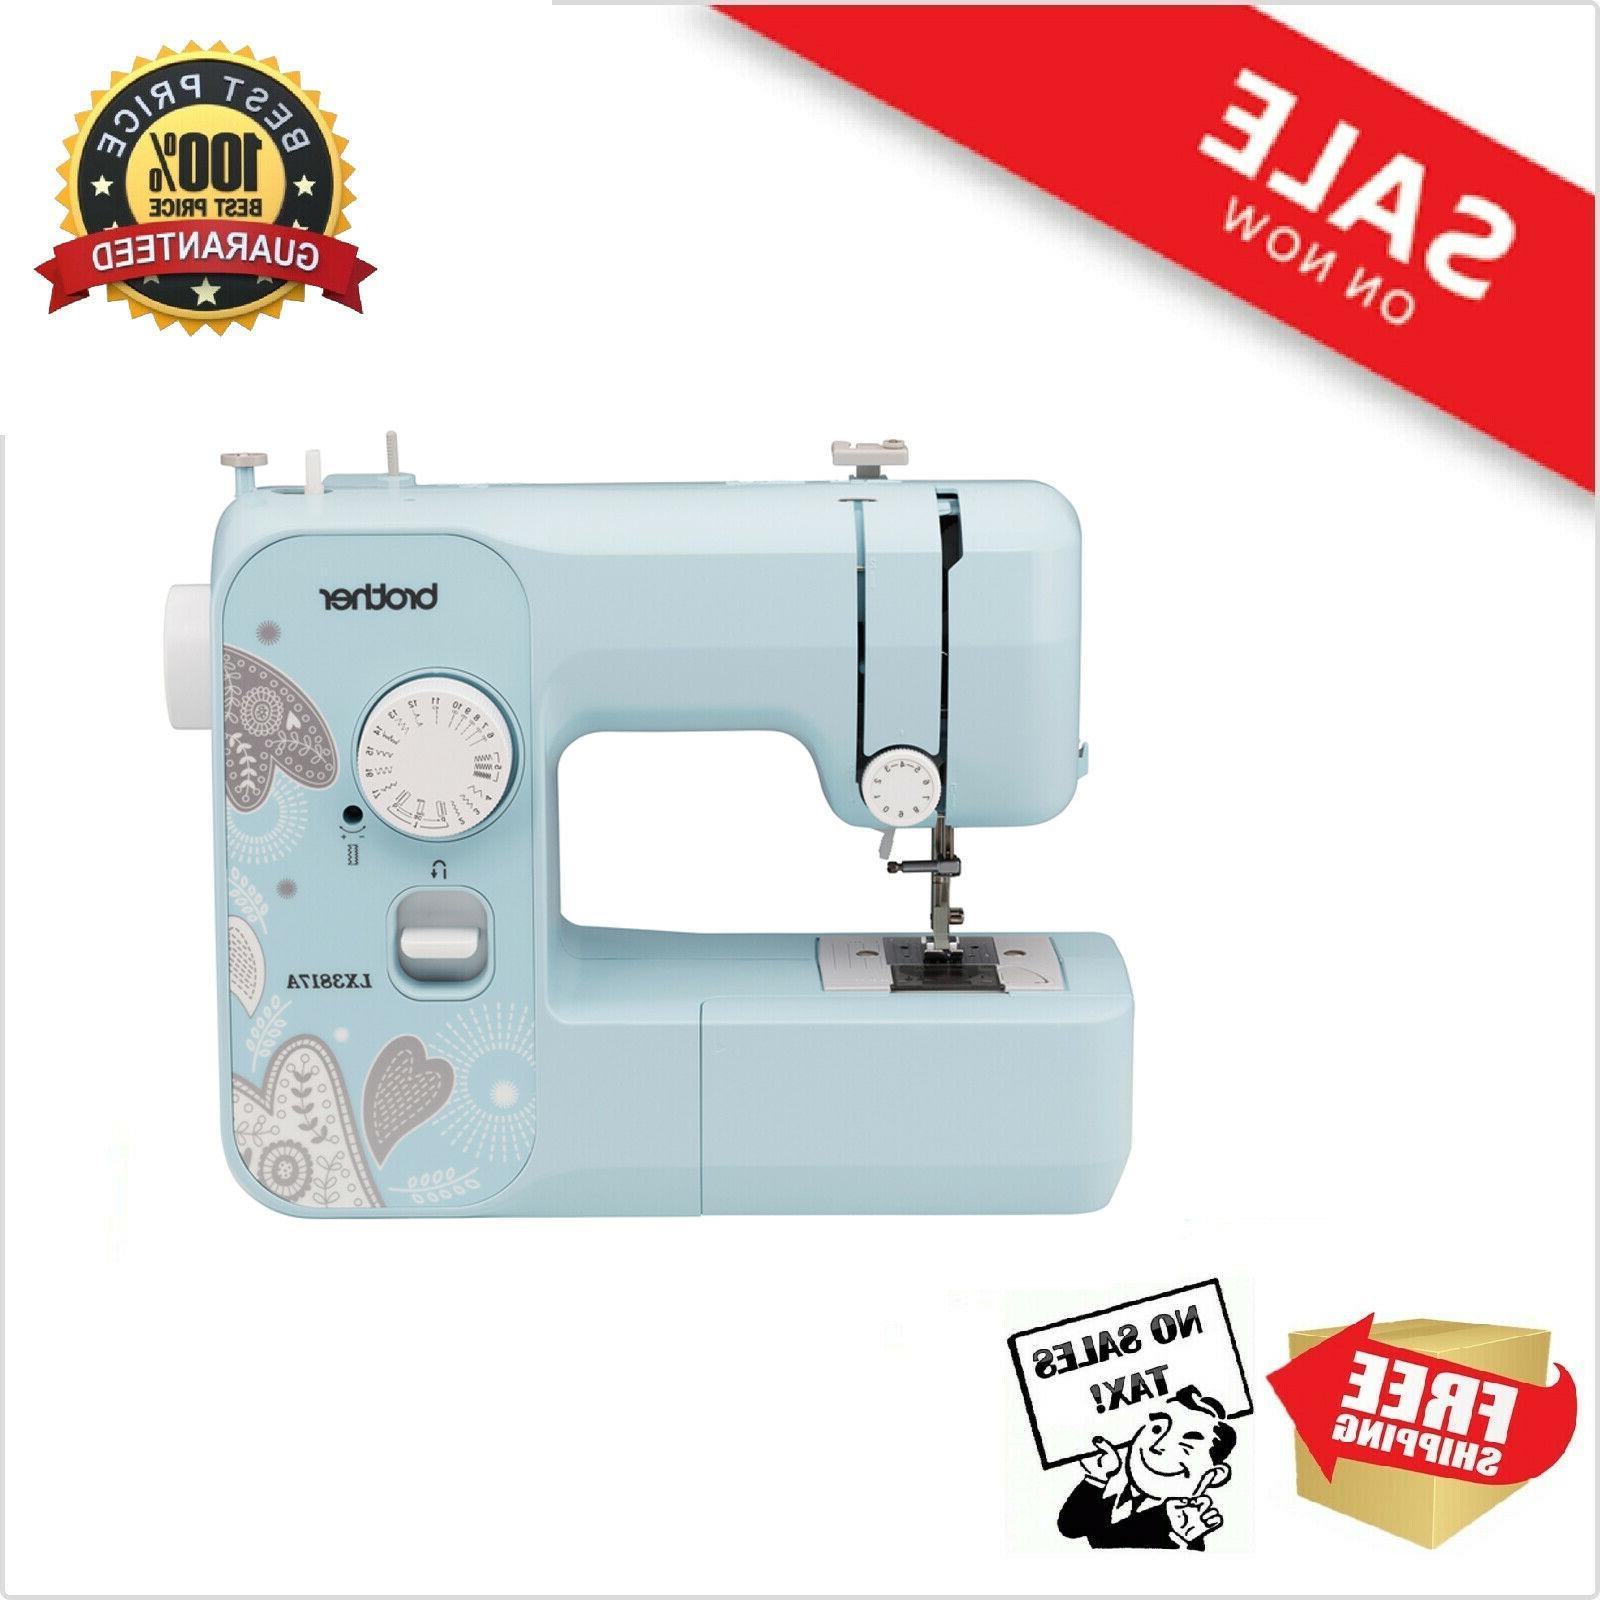 lx3817a 17 stitch full size aqua sewing